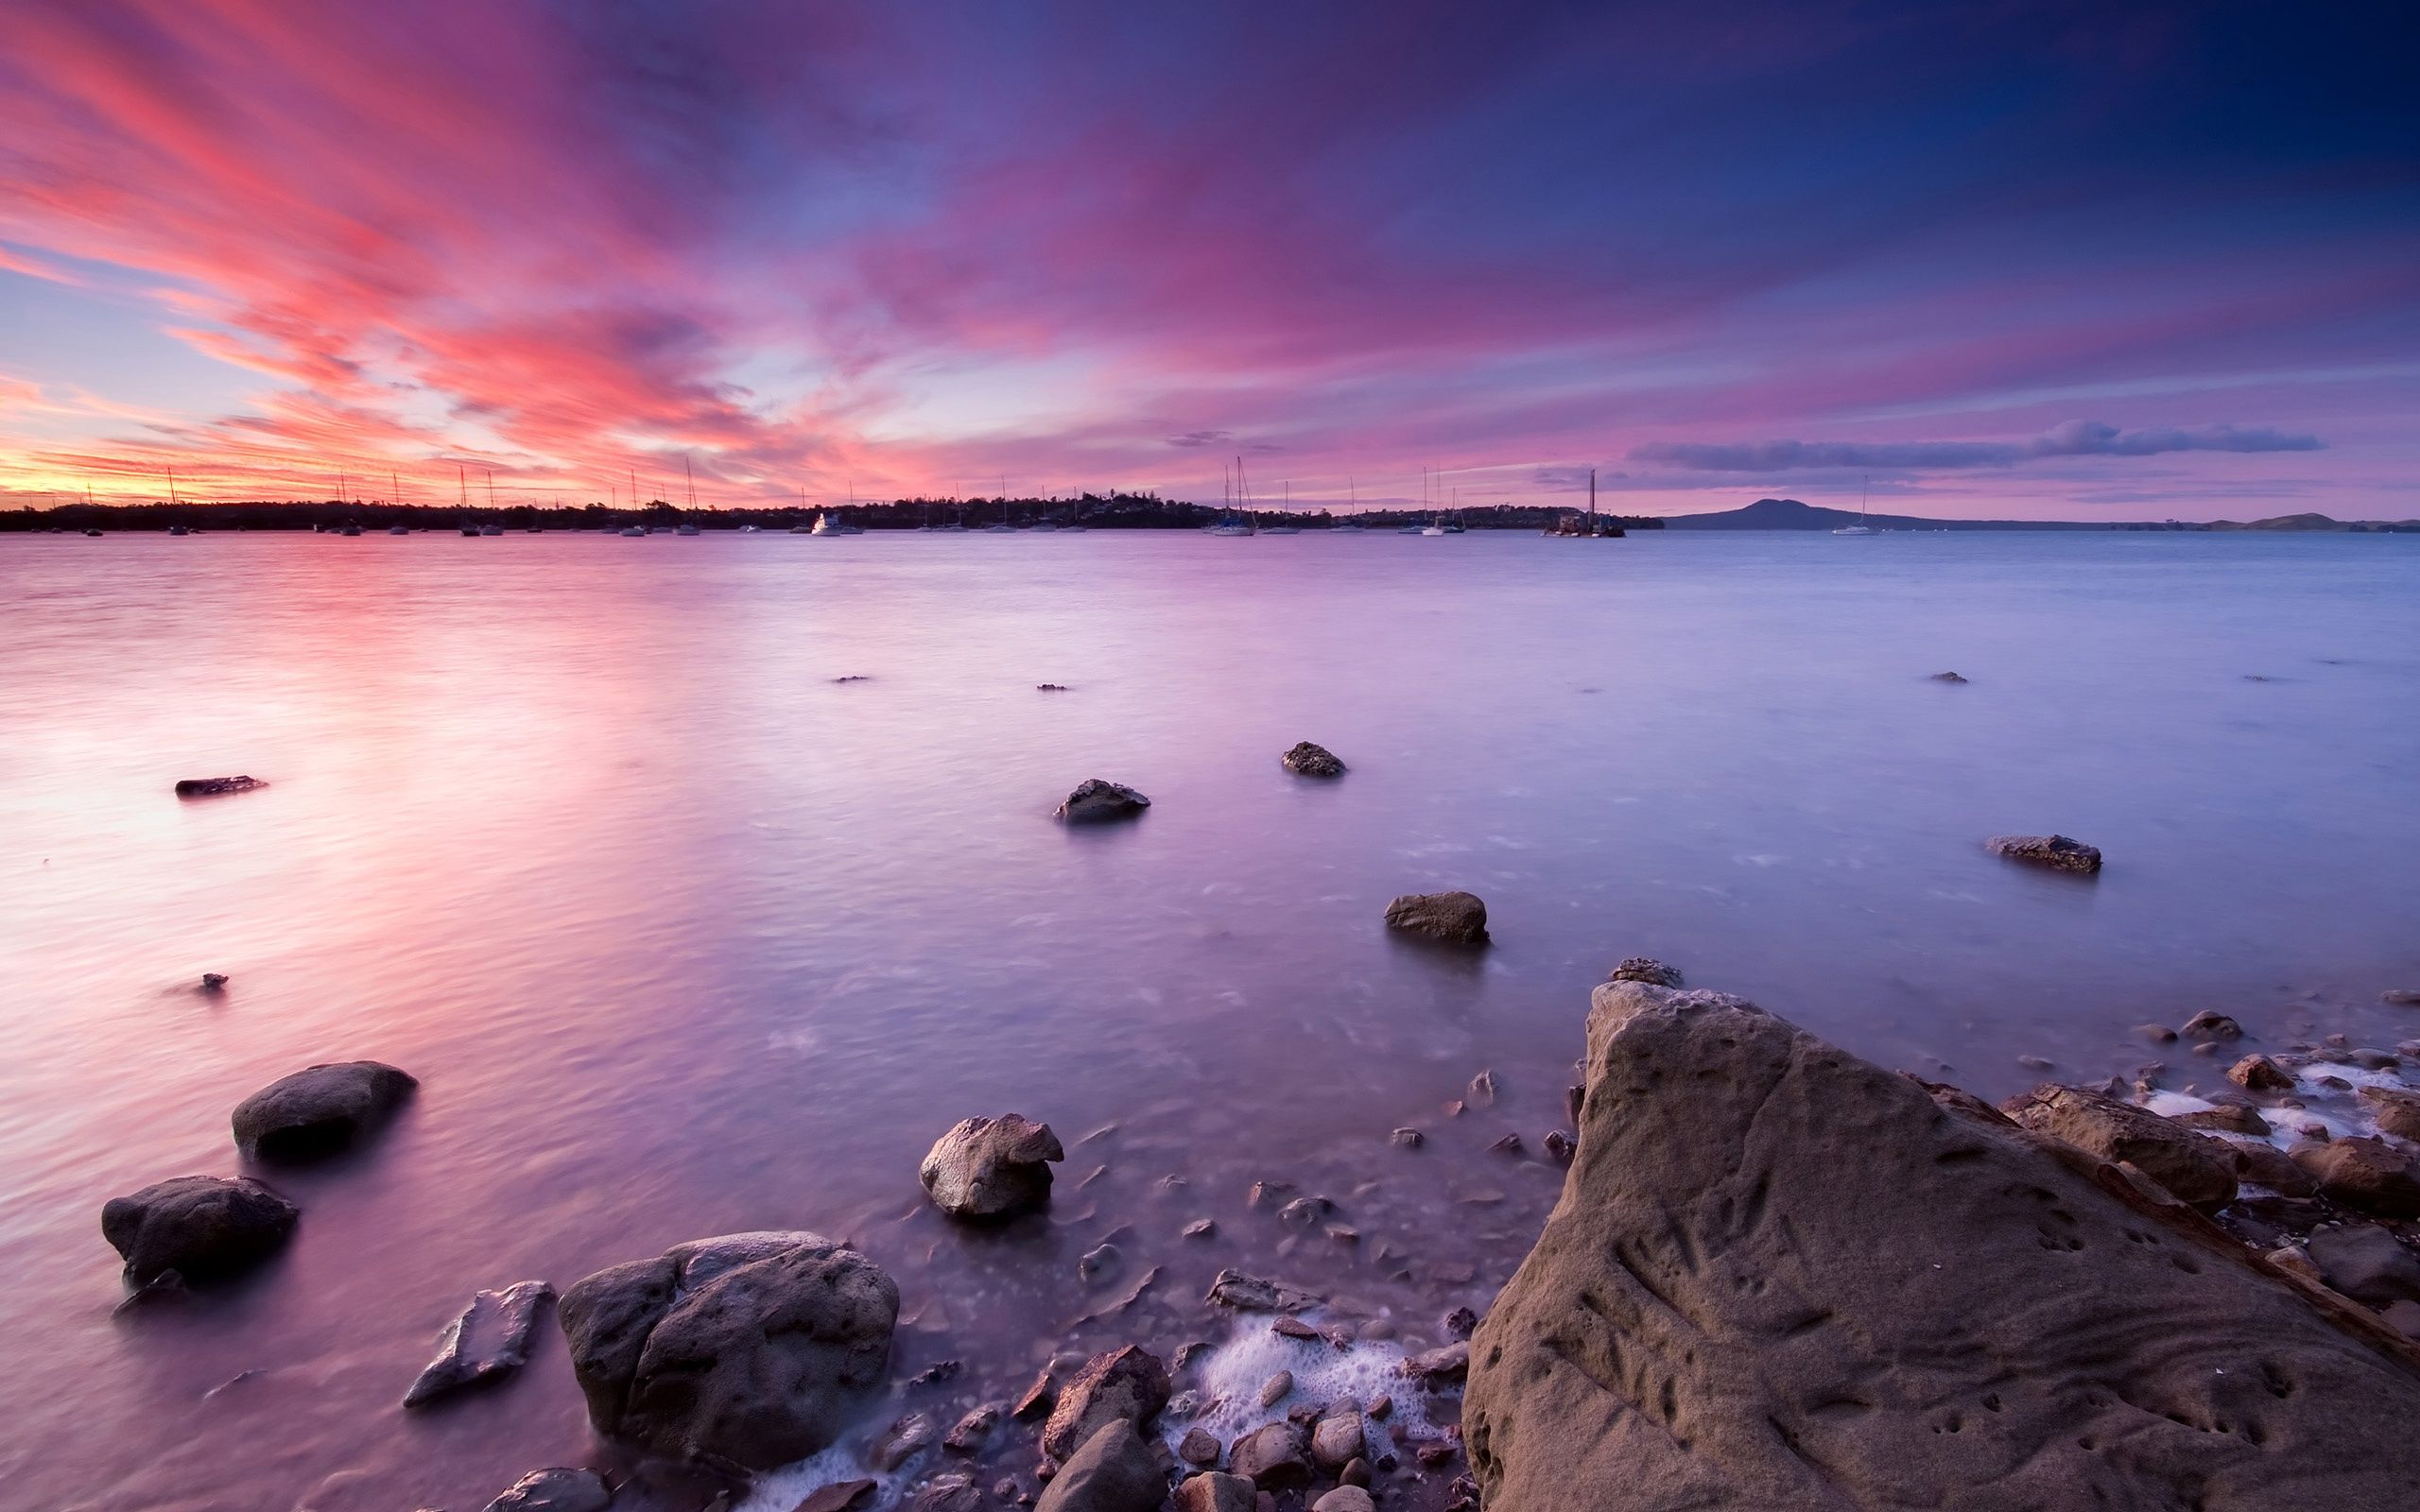 Purple Sunset HD wallpaper #1728540